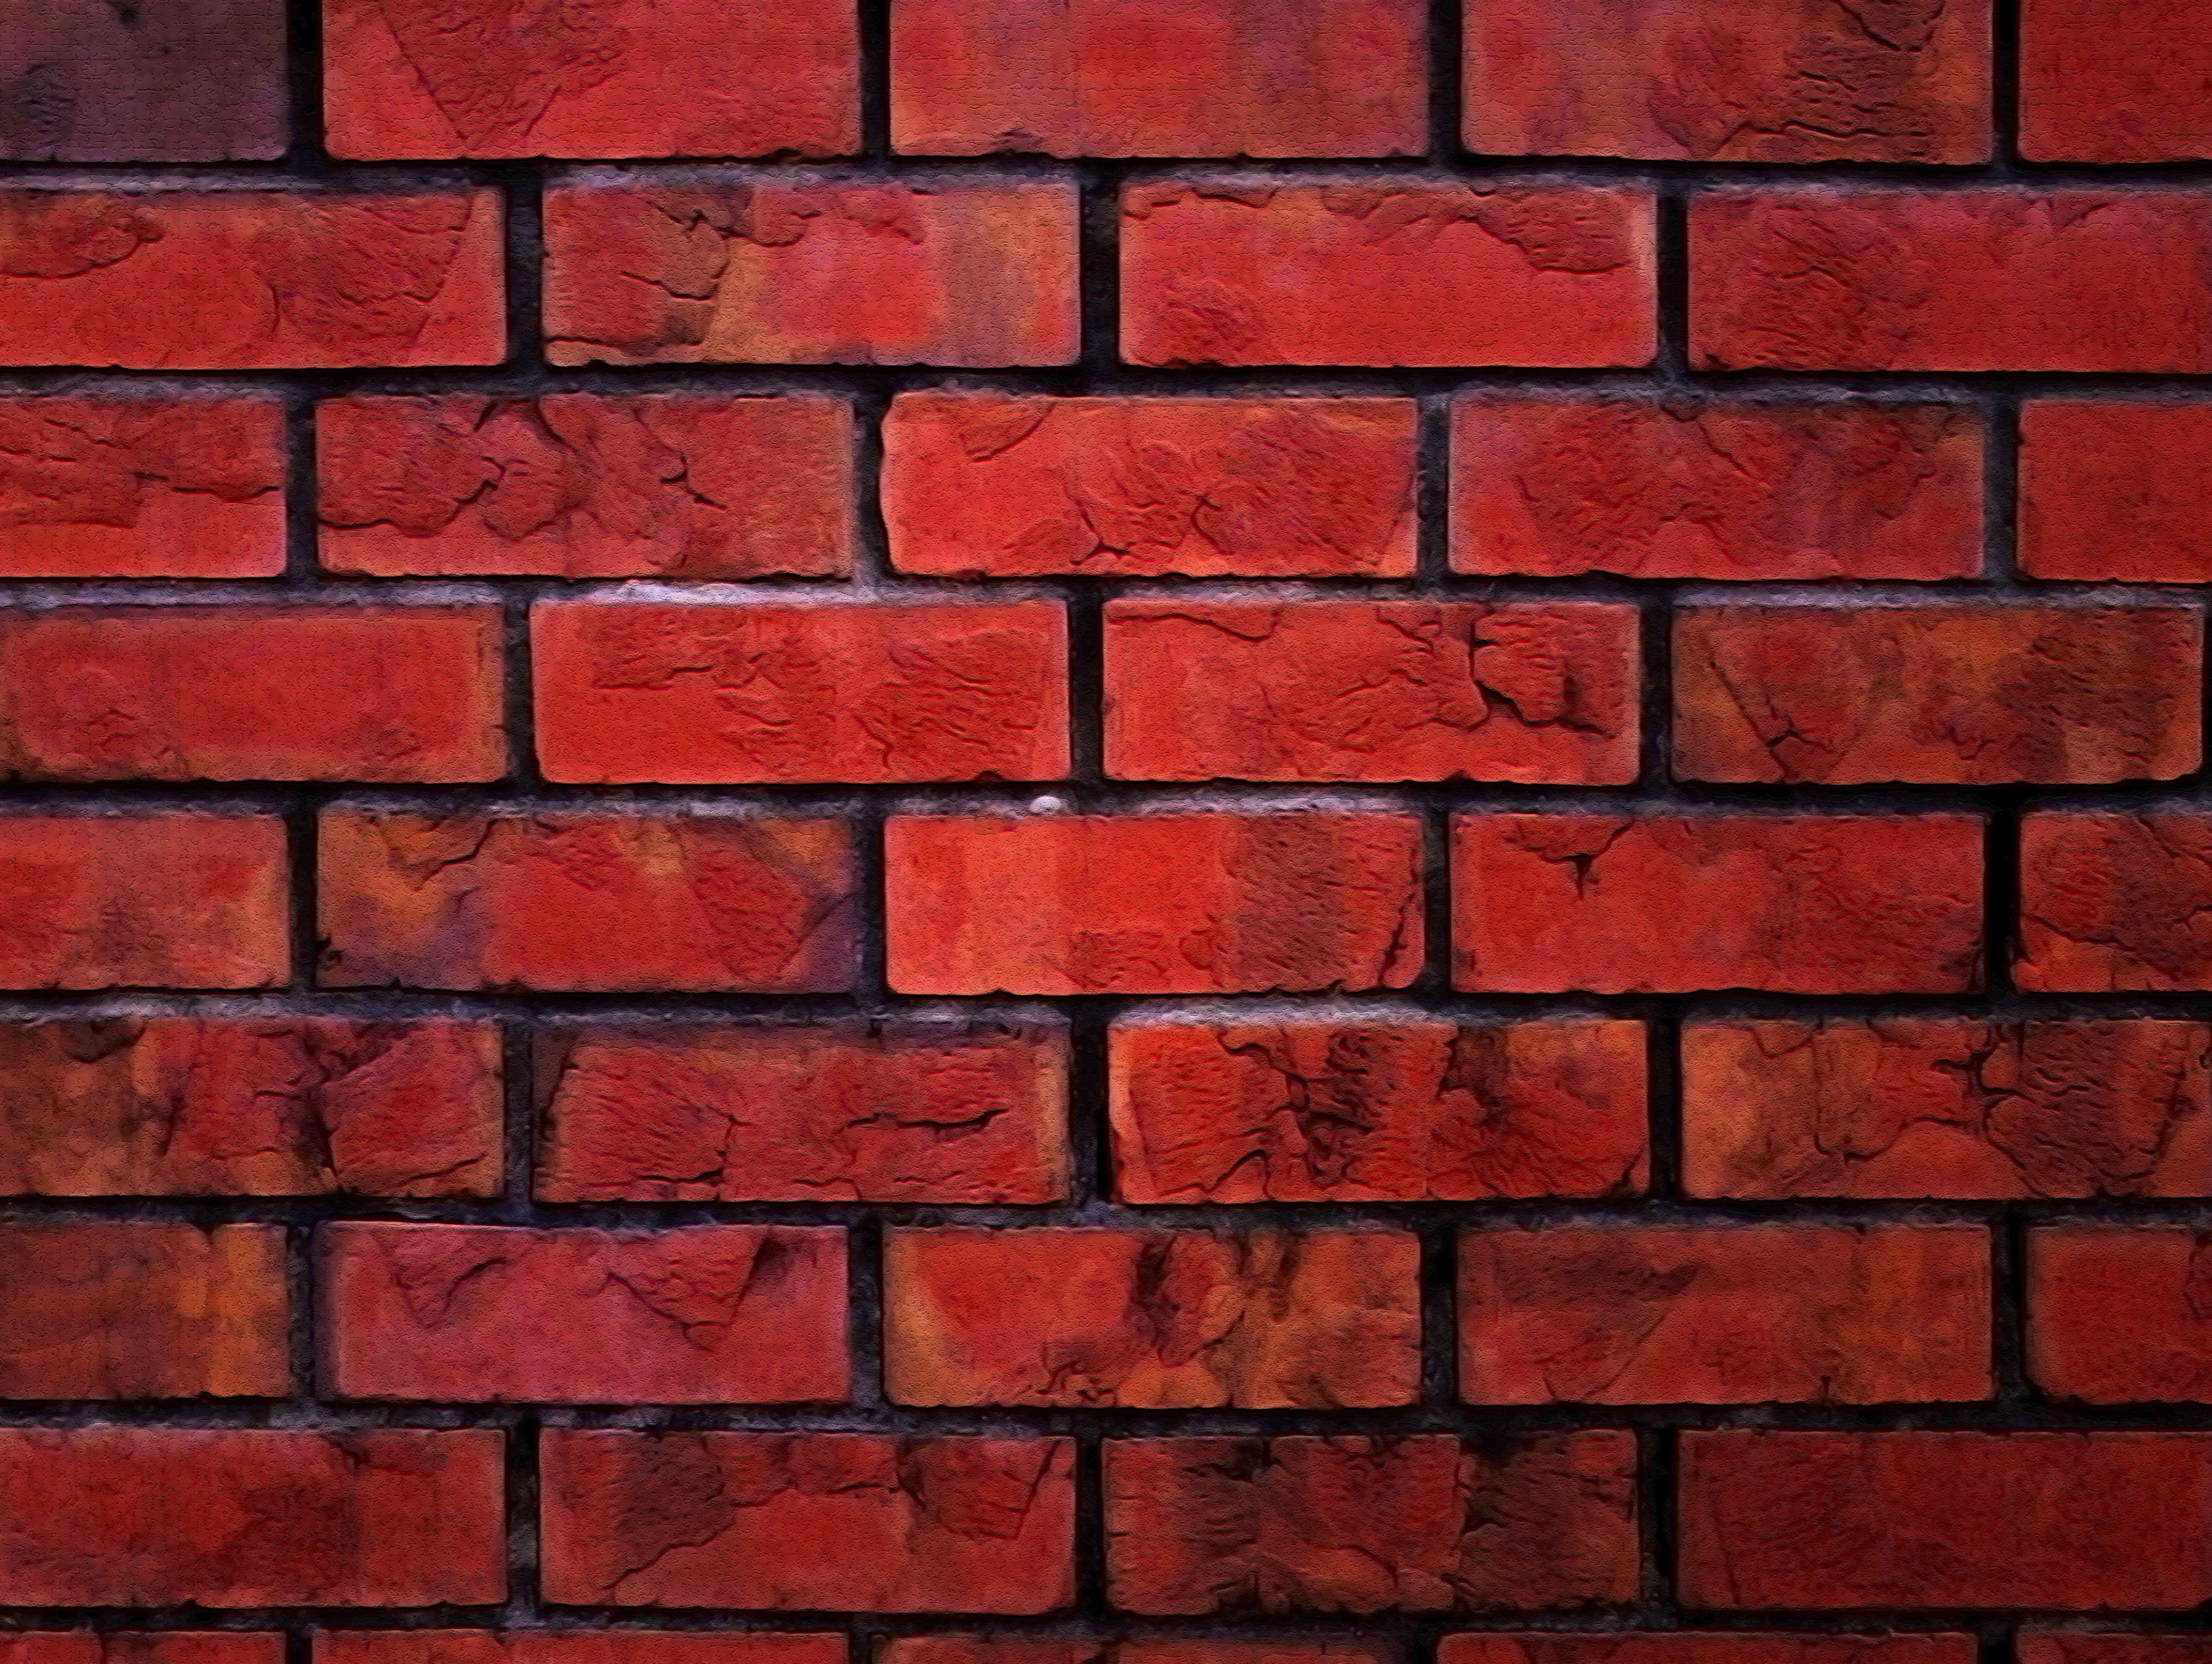 Brick wallpaper clipart clipart black and white download Brick wallpaper clipart - Clip Art Library clipart black and white download